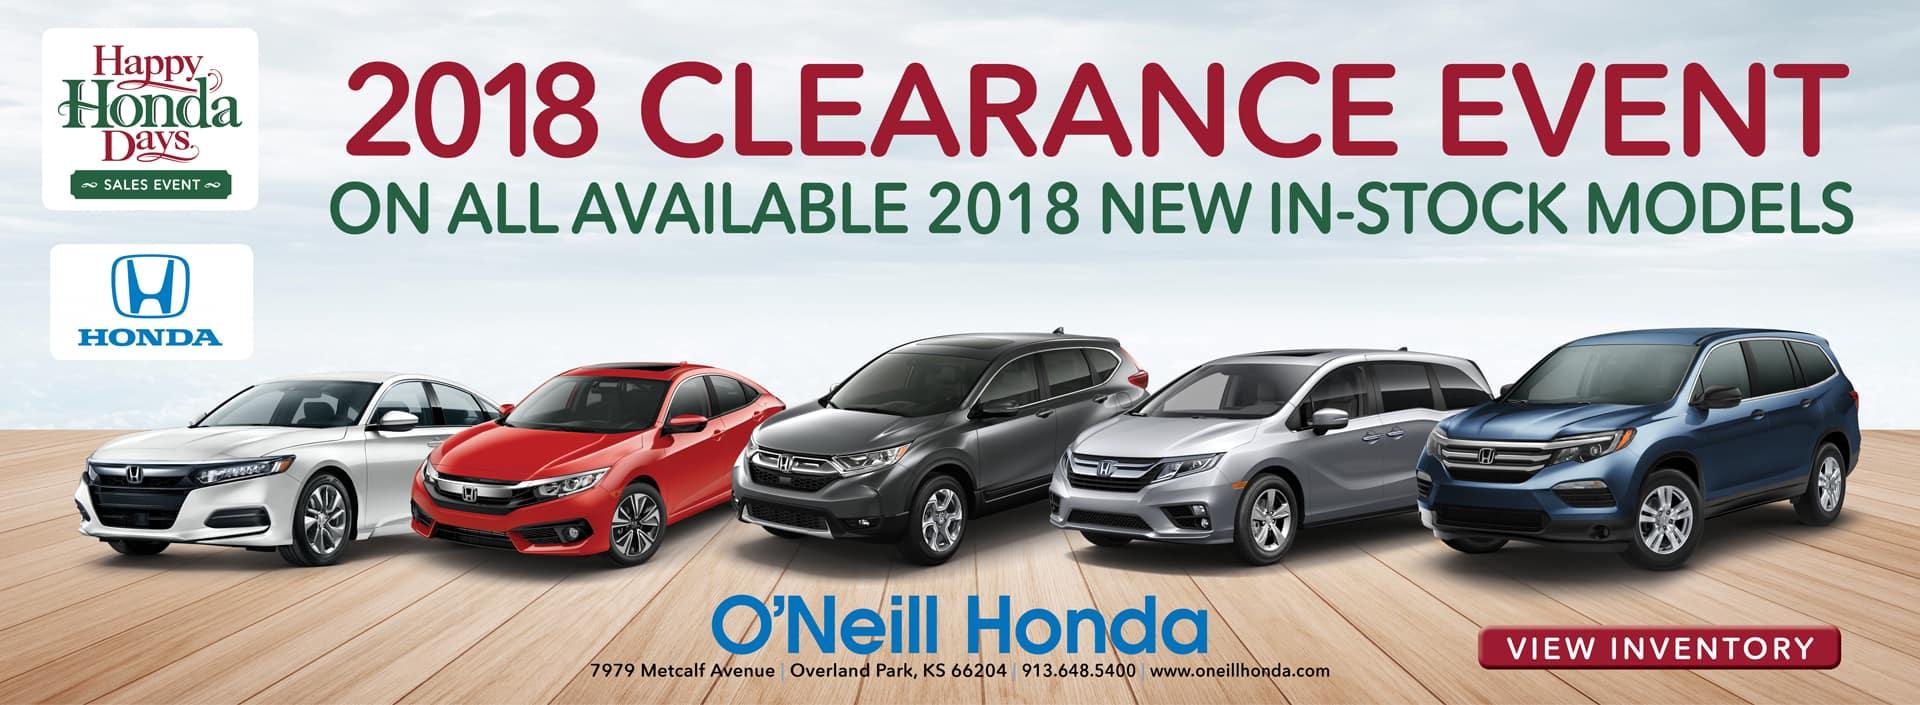 Oneill Honda New Dealership Kansas City Overland Park Motor Blower All Recall Info Accepting Orders For